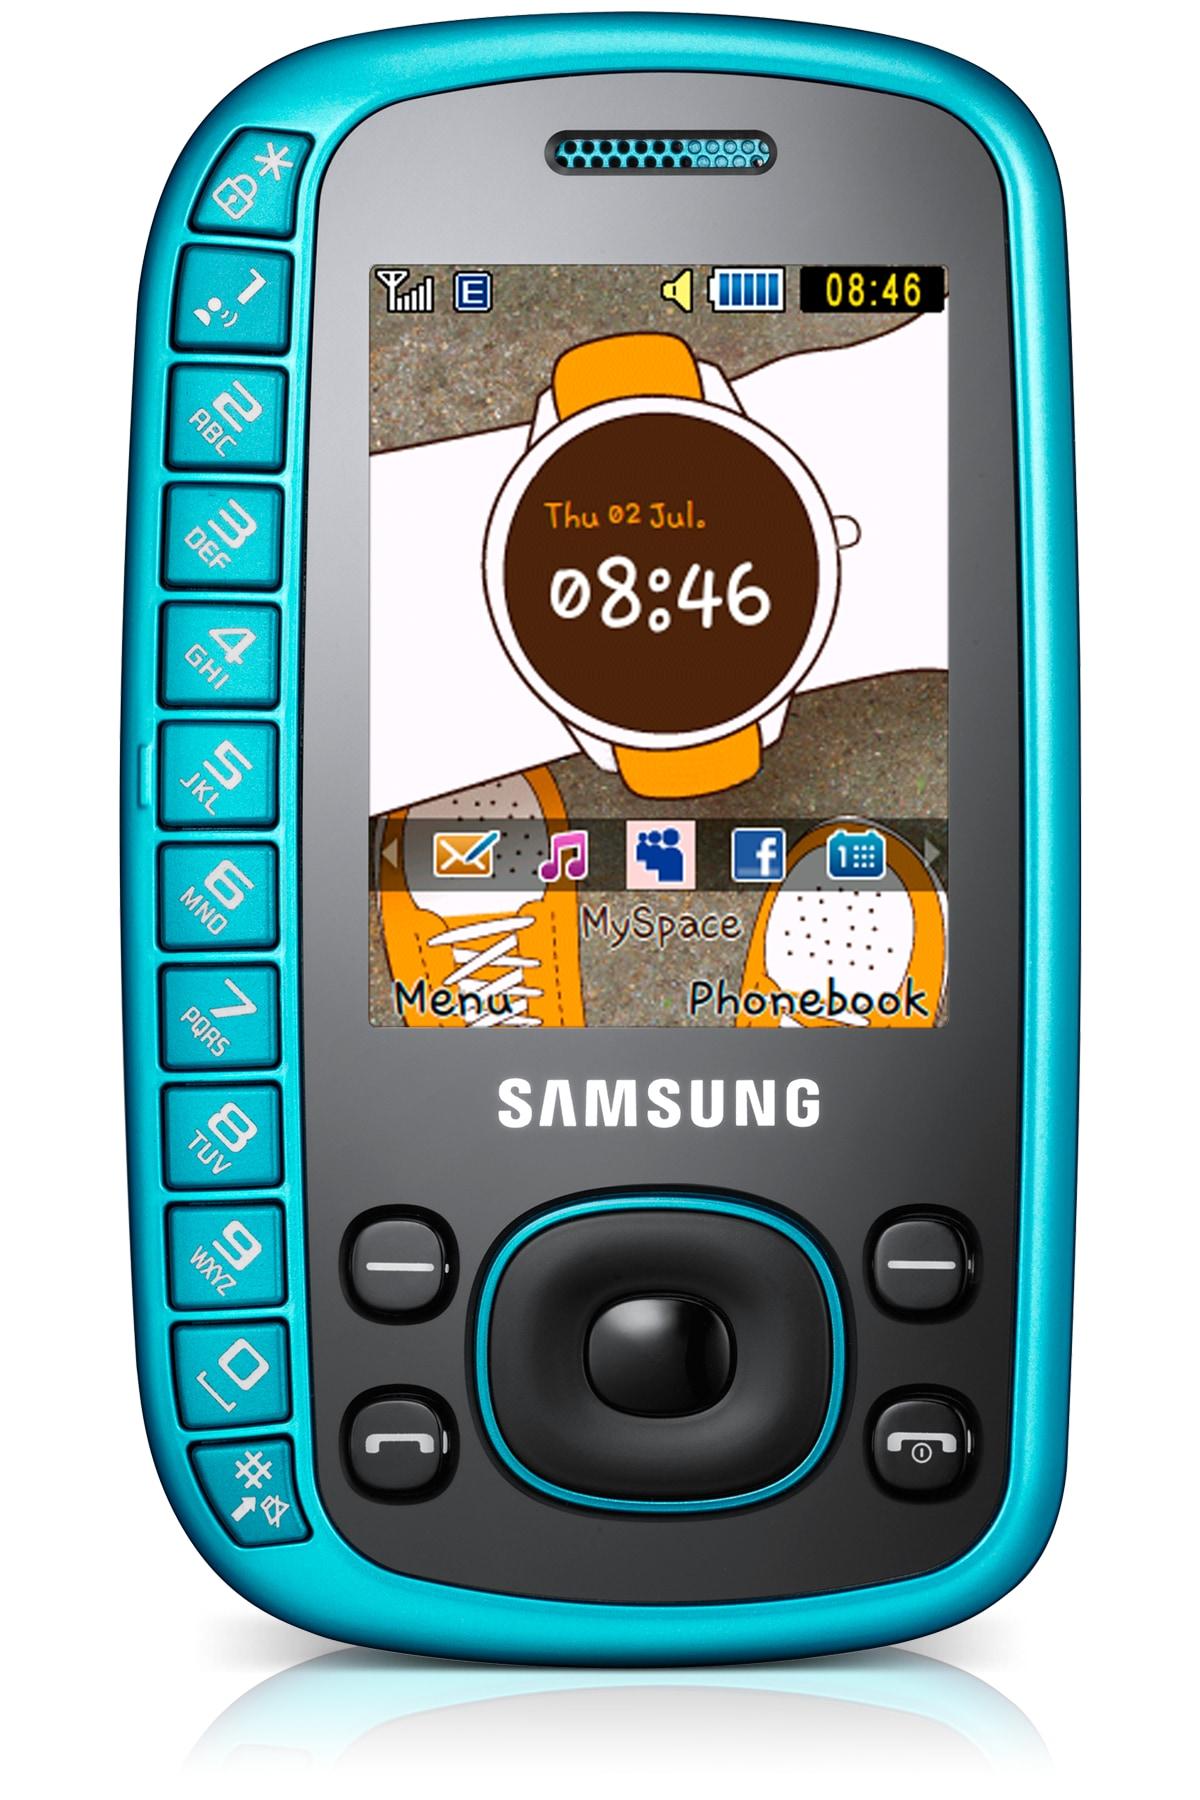 SAMSUNG B3310 Gray | Samsung Support Philippines